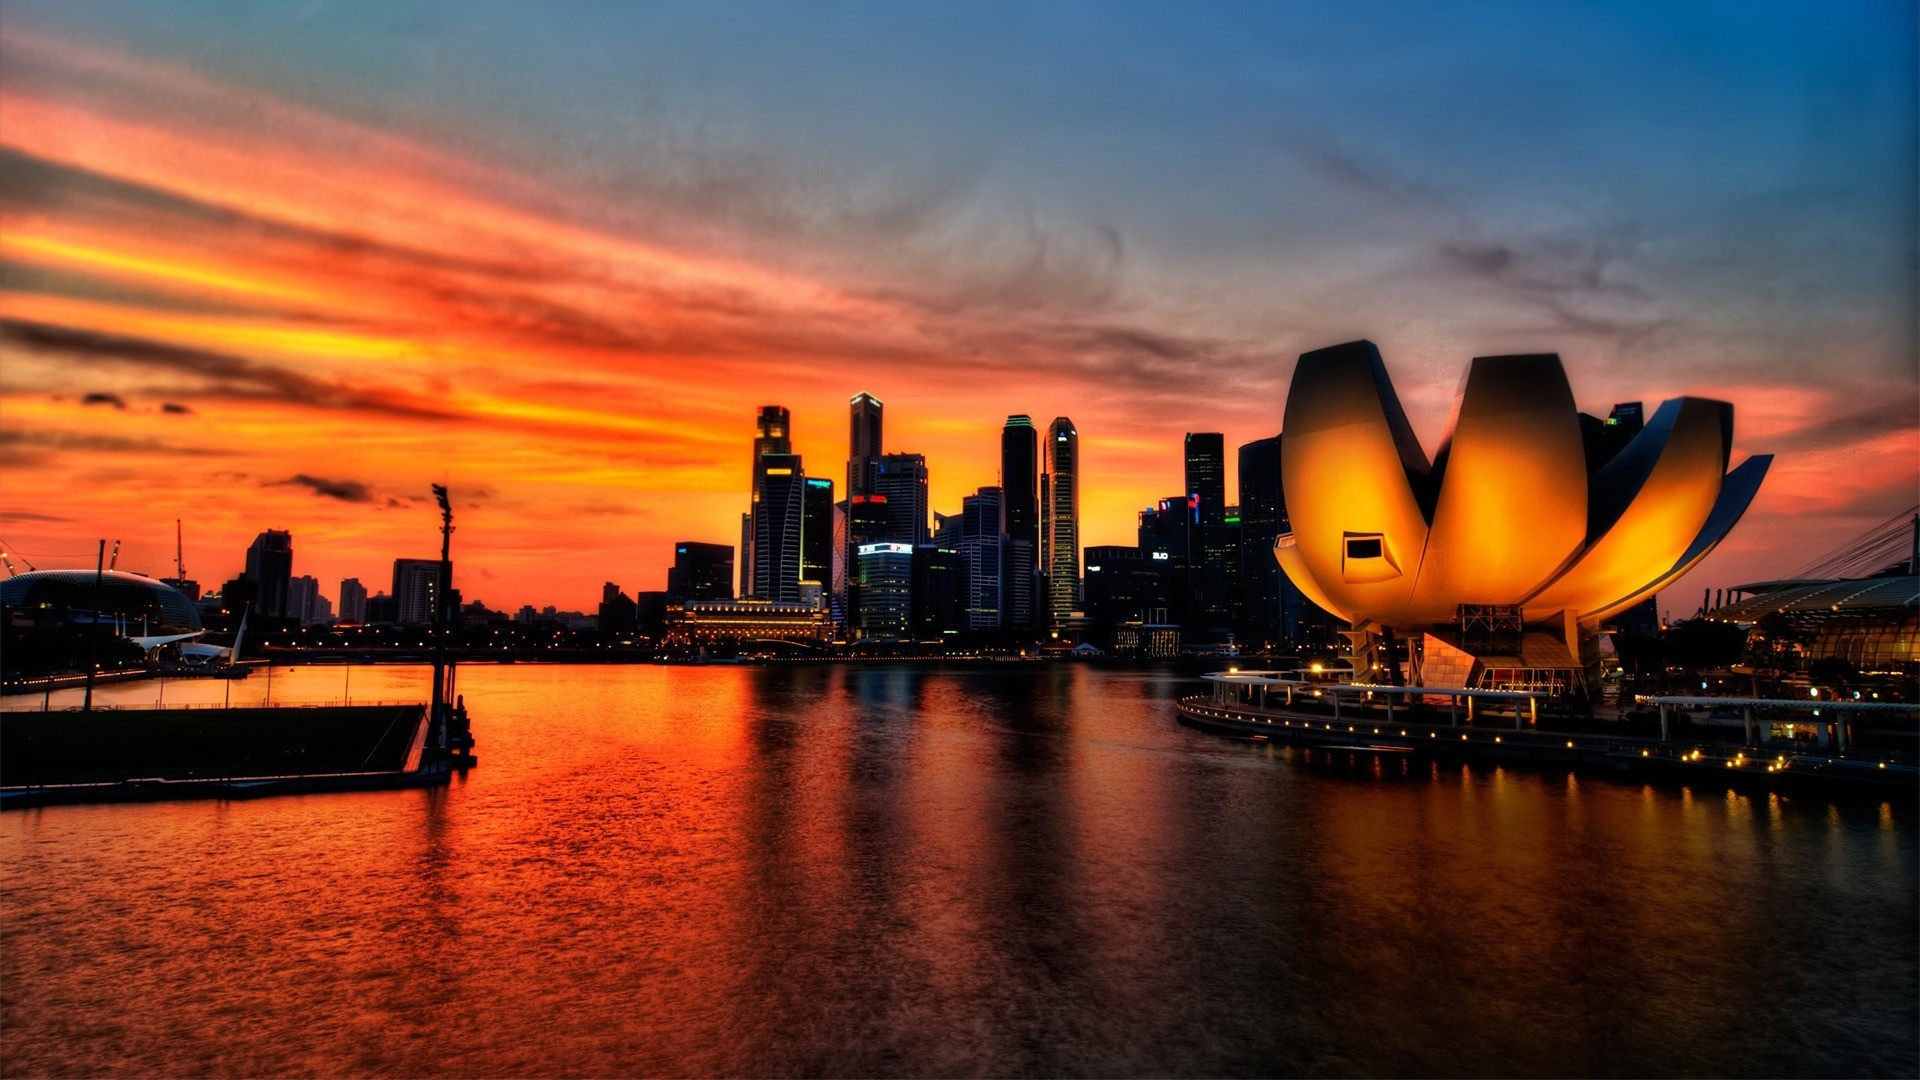 city sunset wallpaper 7106 - photo #49